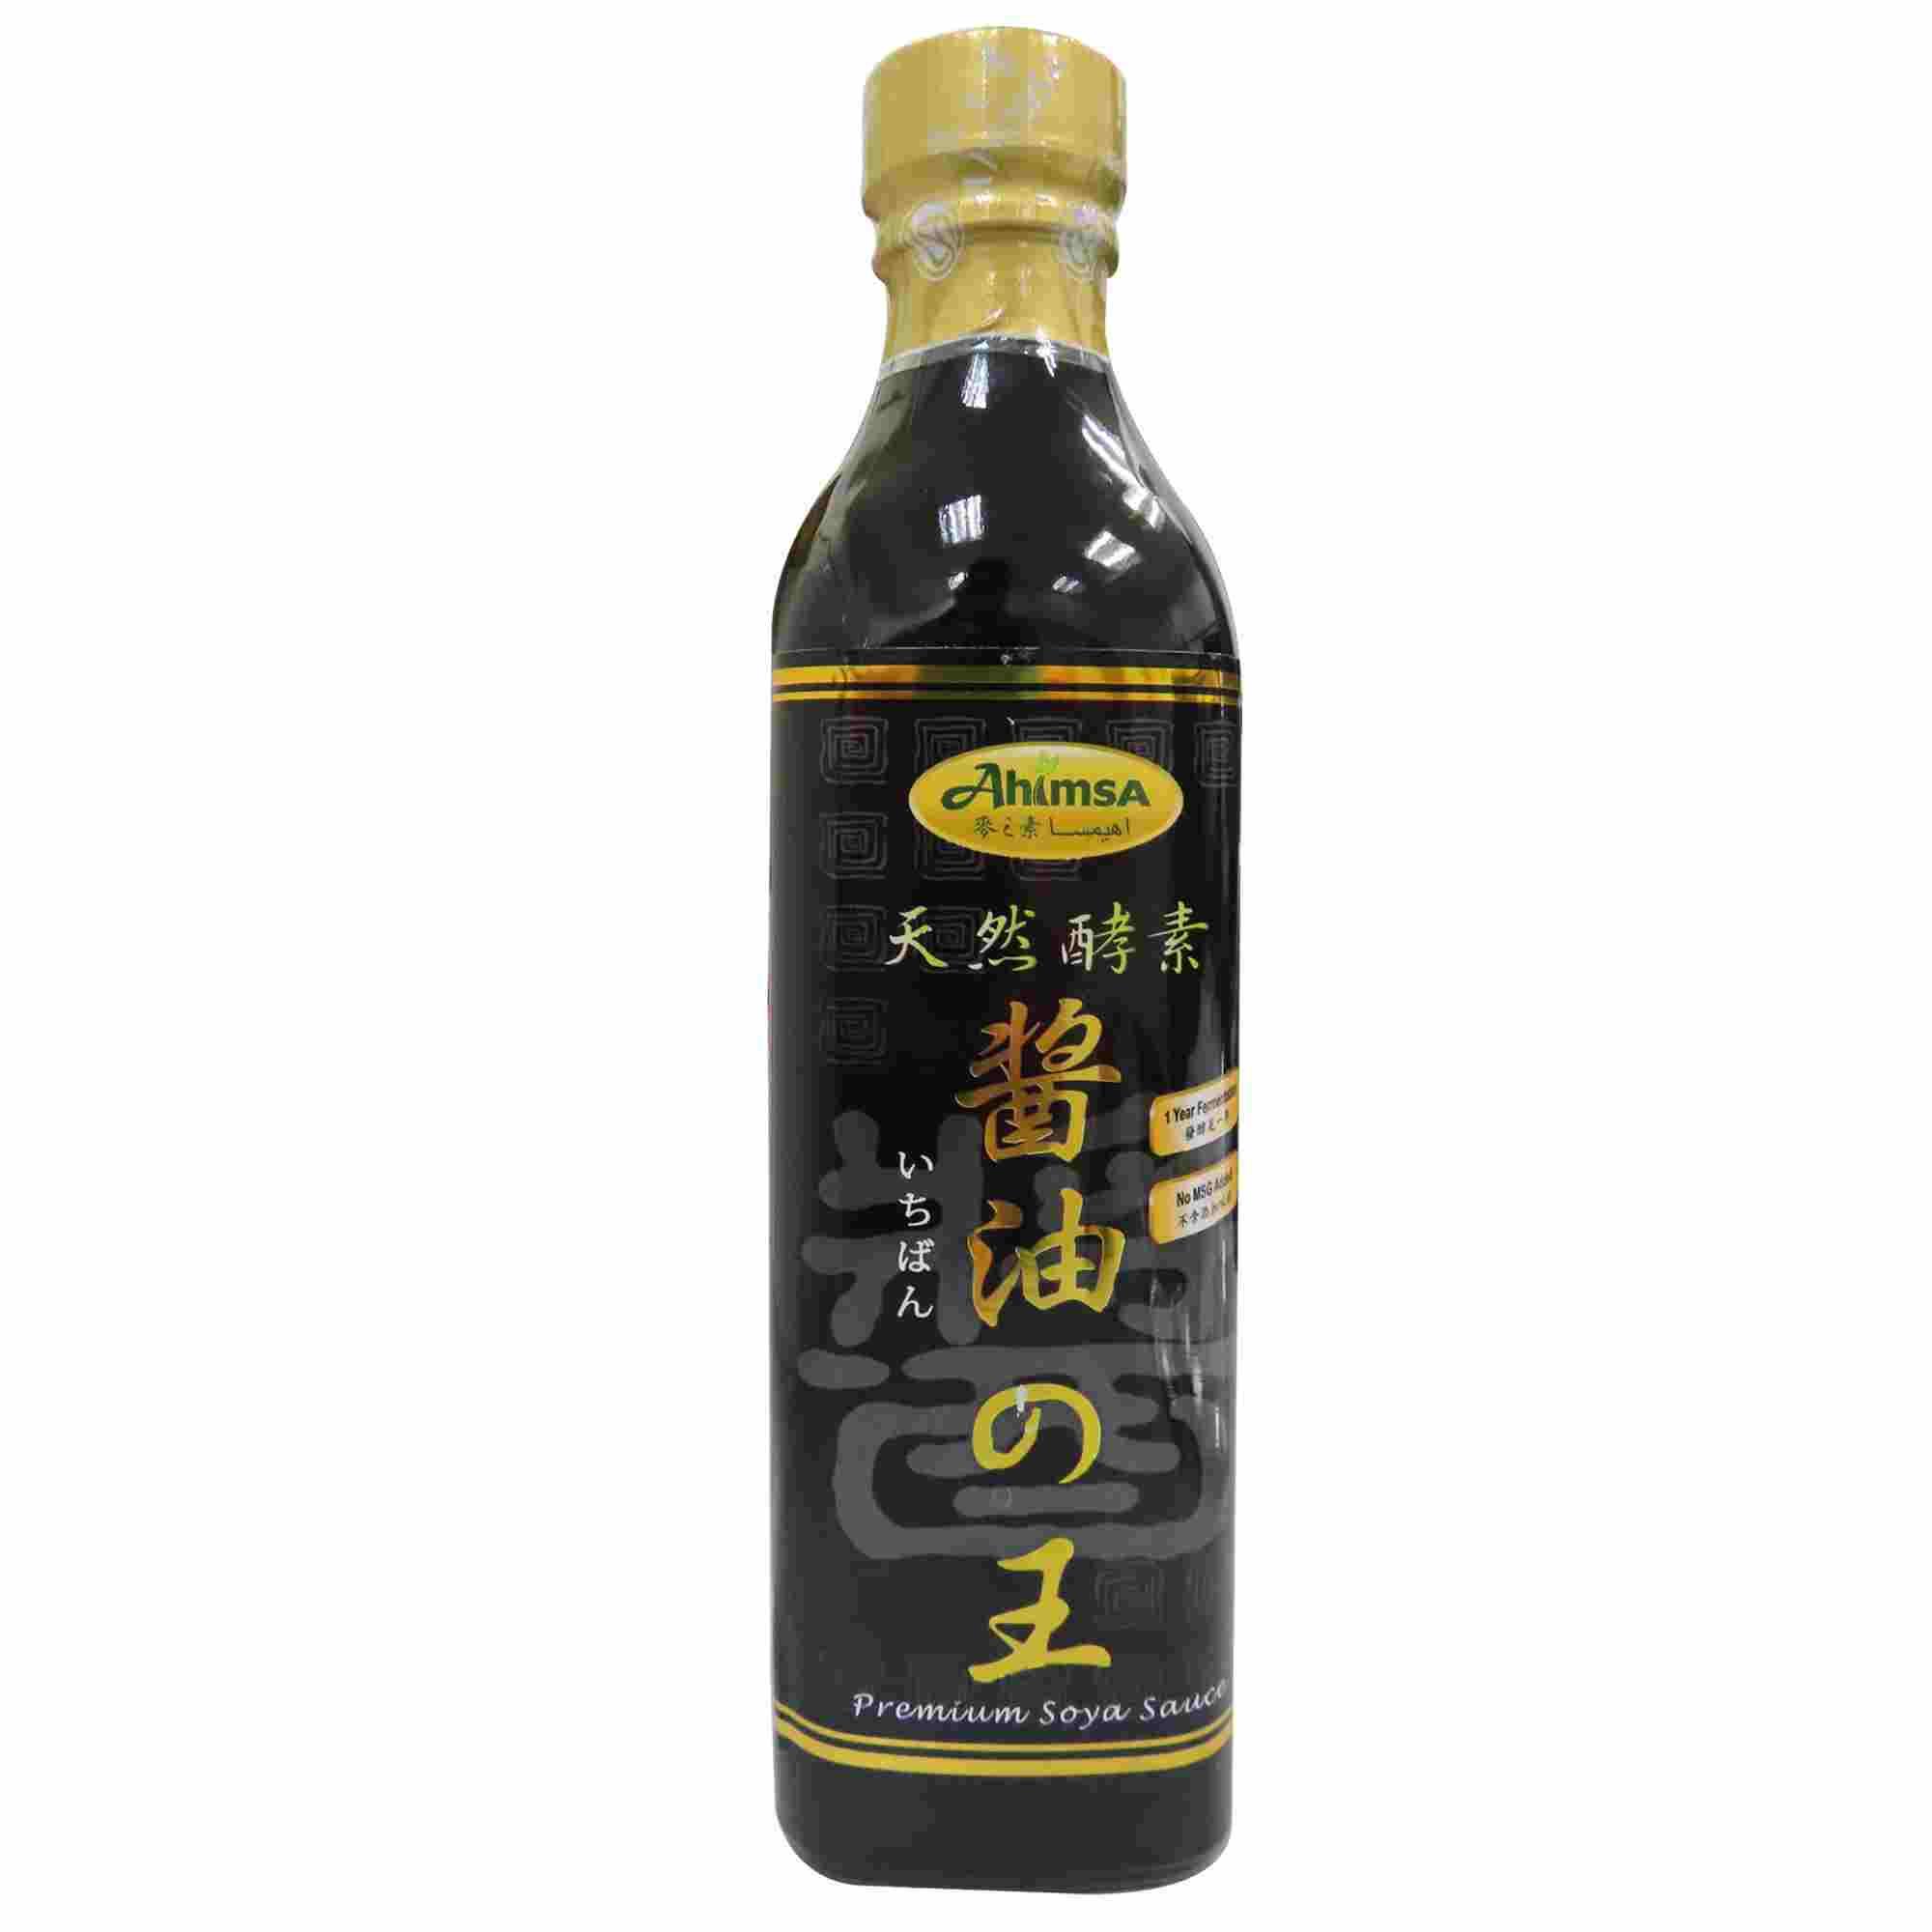 Image Ashimsa Premium Soya Sauce 麦之素酱油の王 500grams